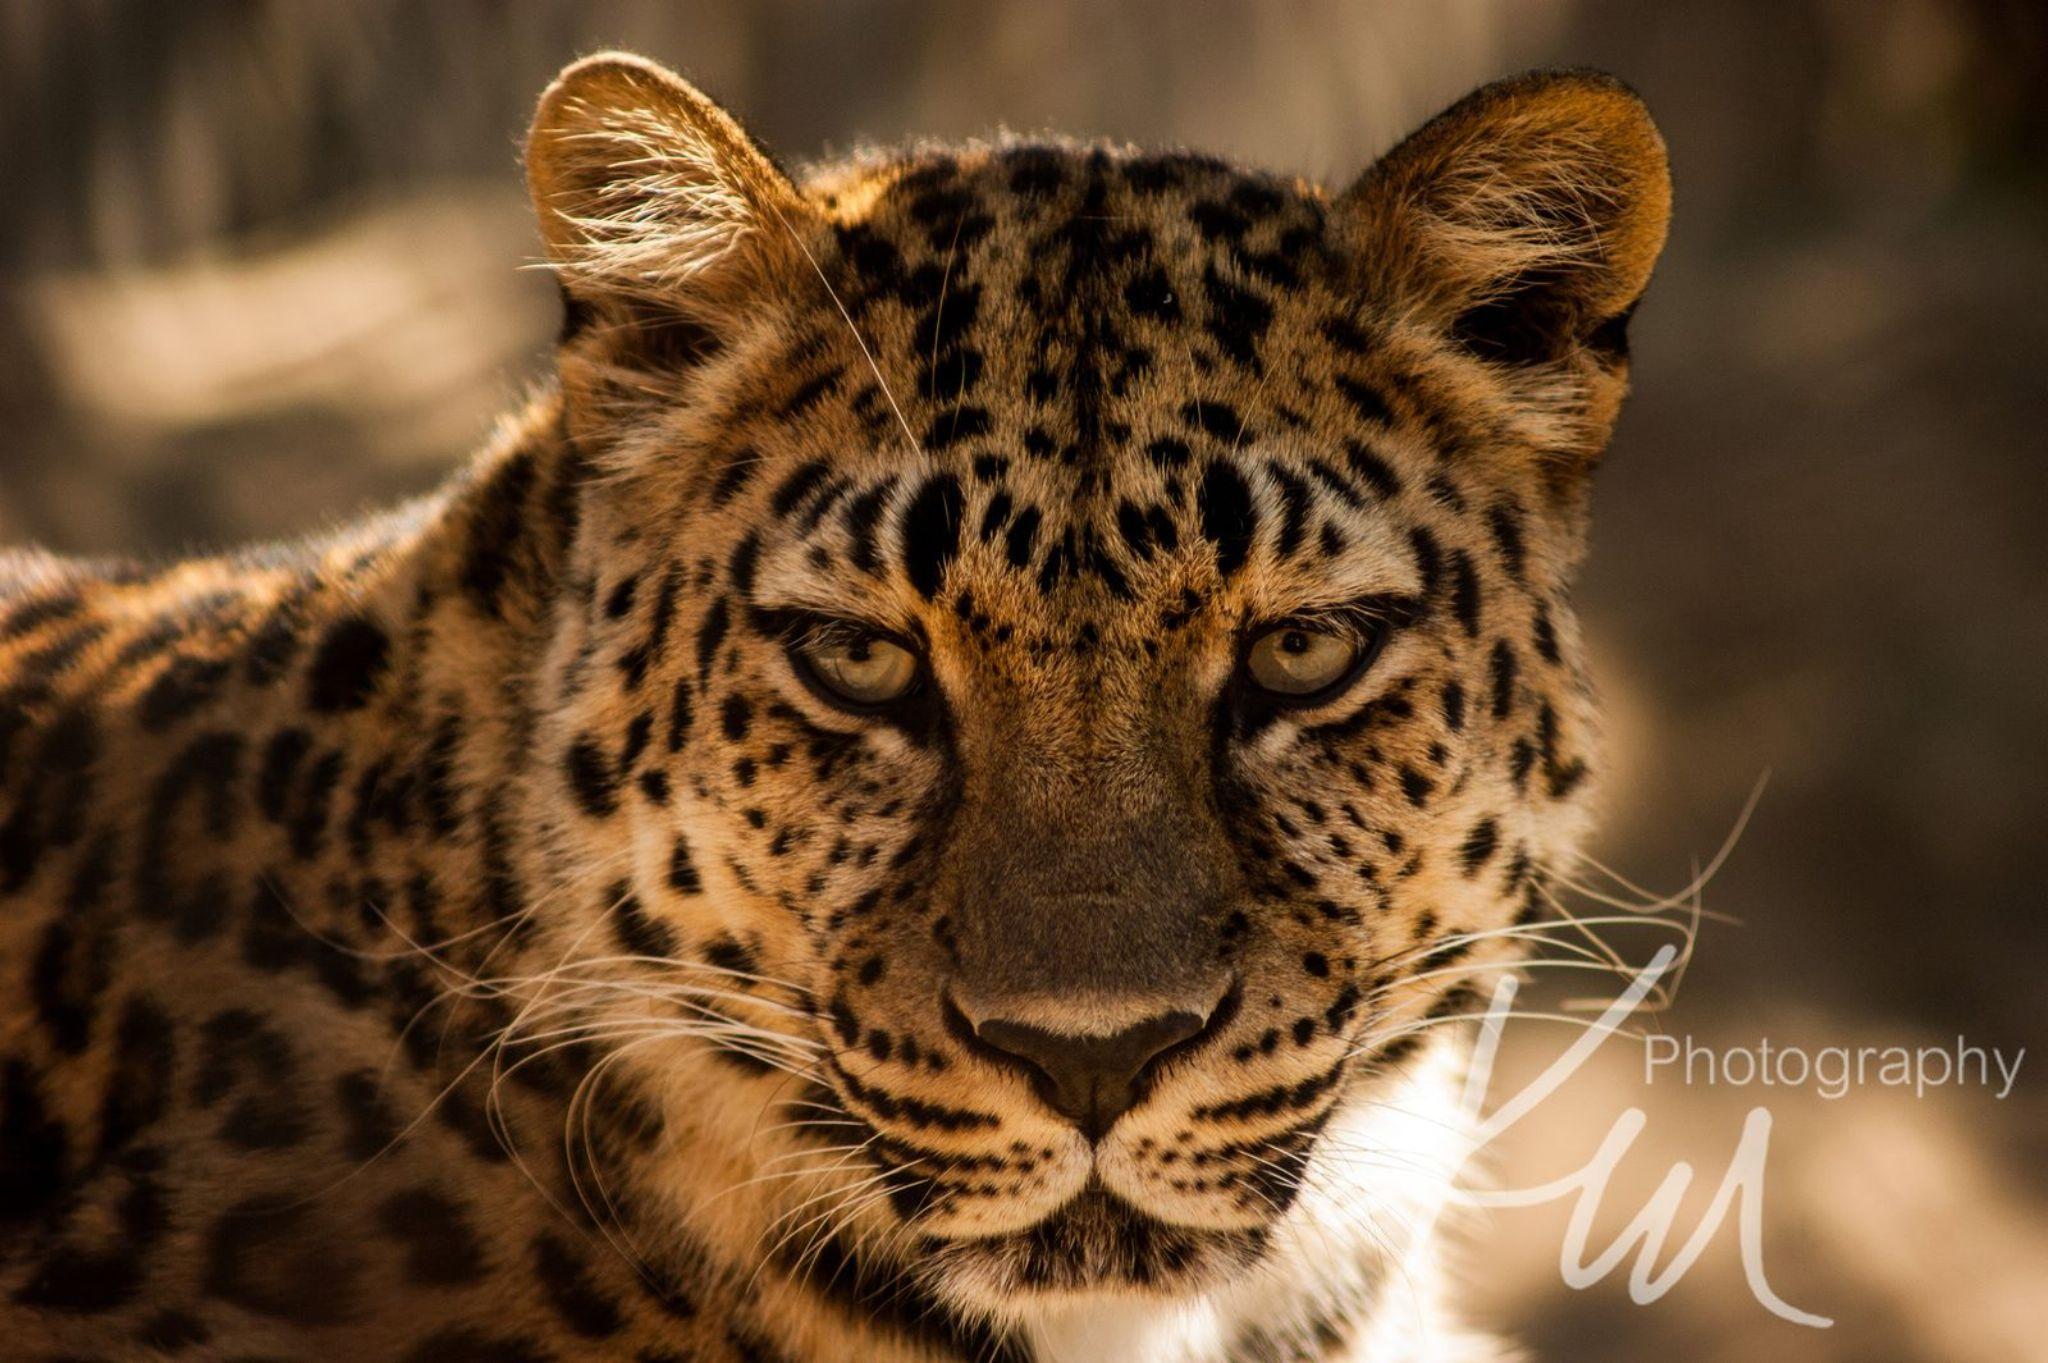 Leopard Stare Down by Kali Morgan